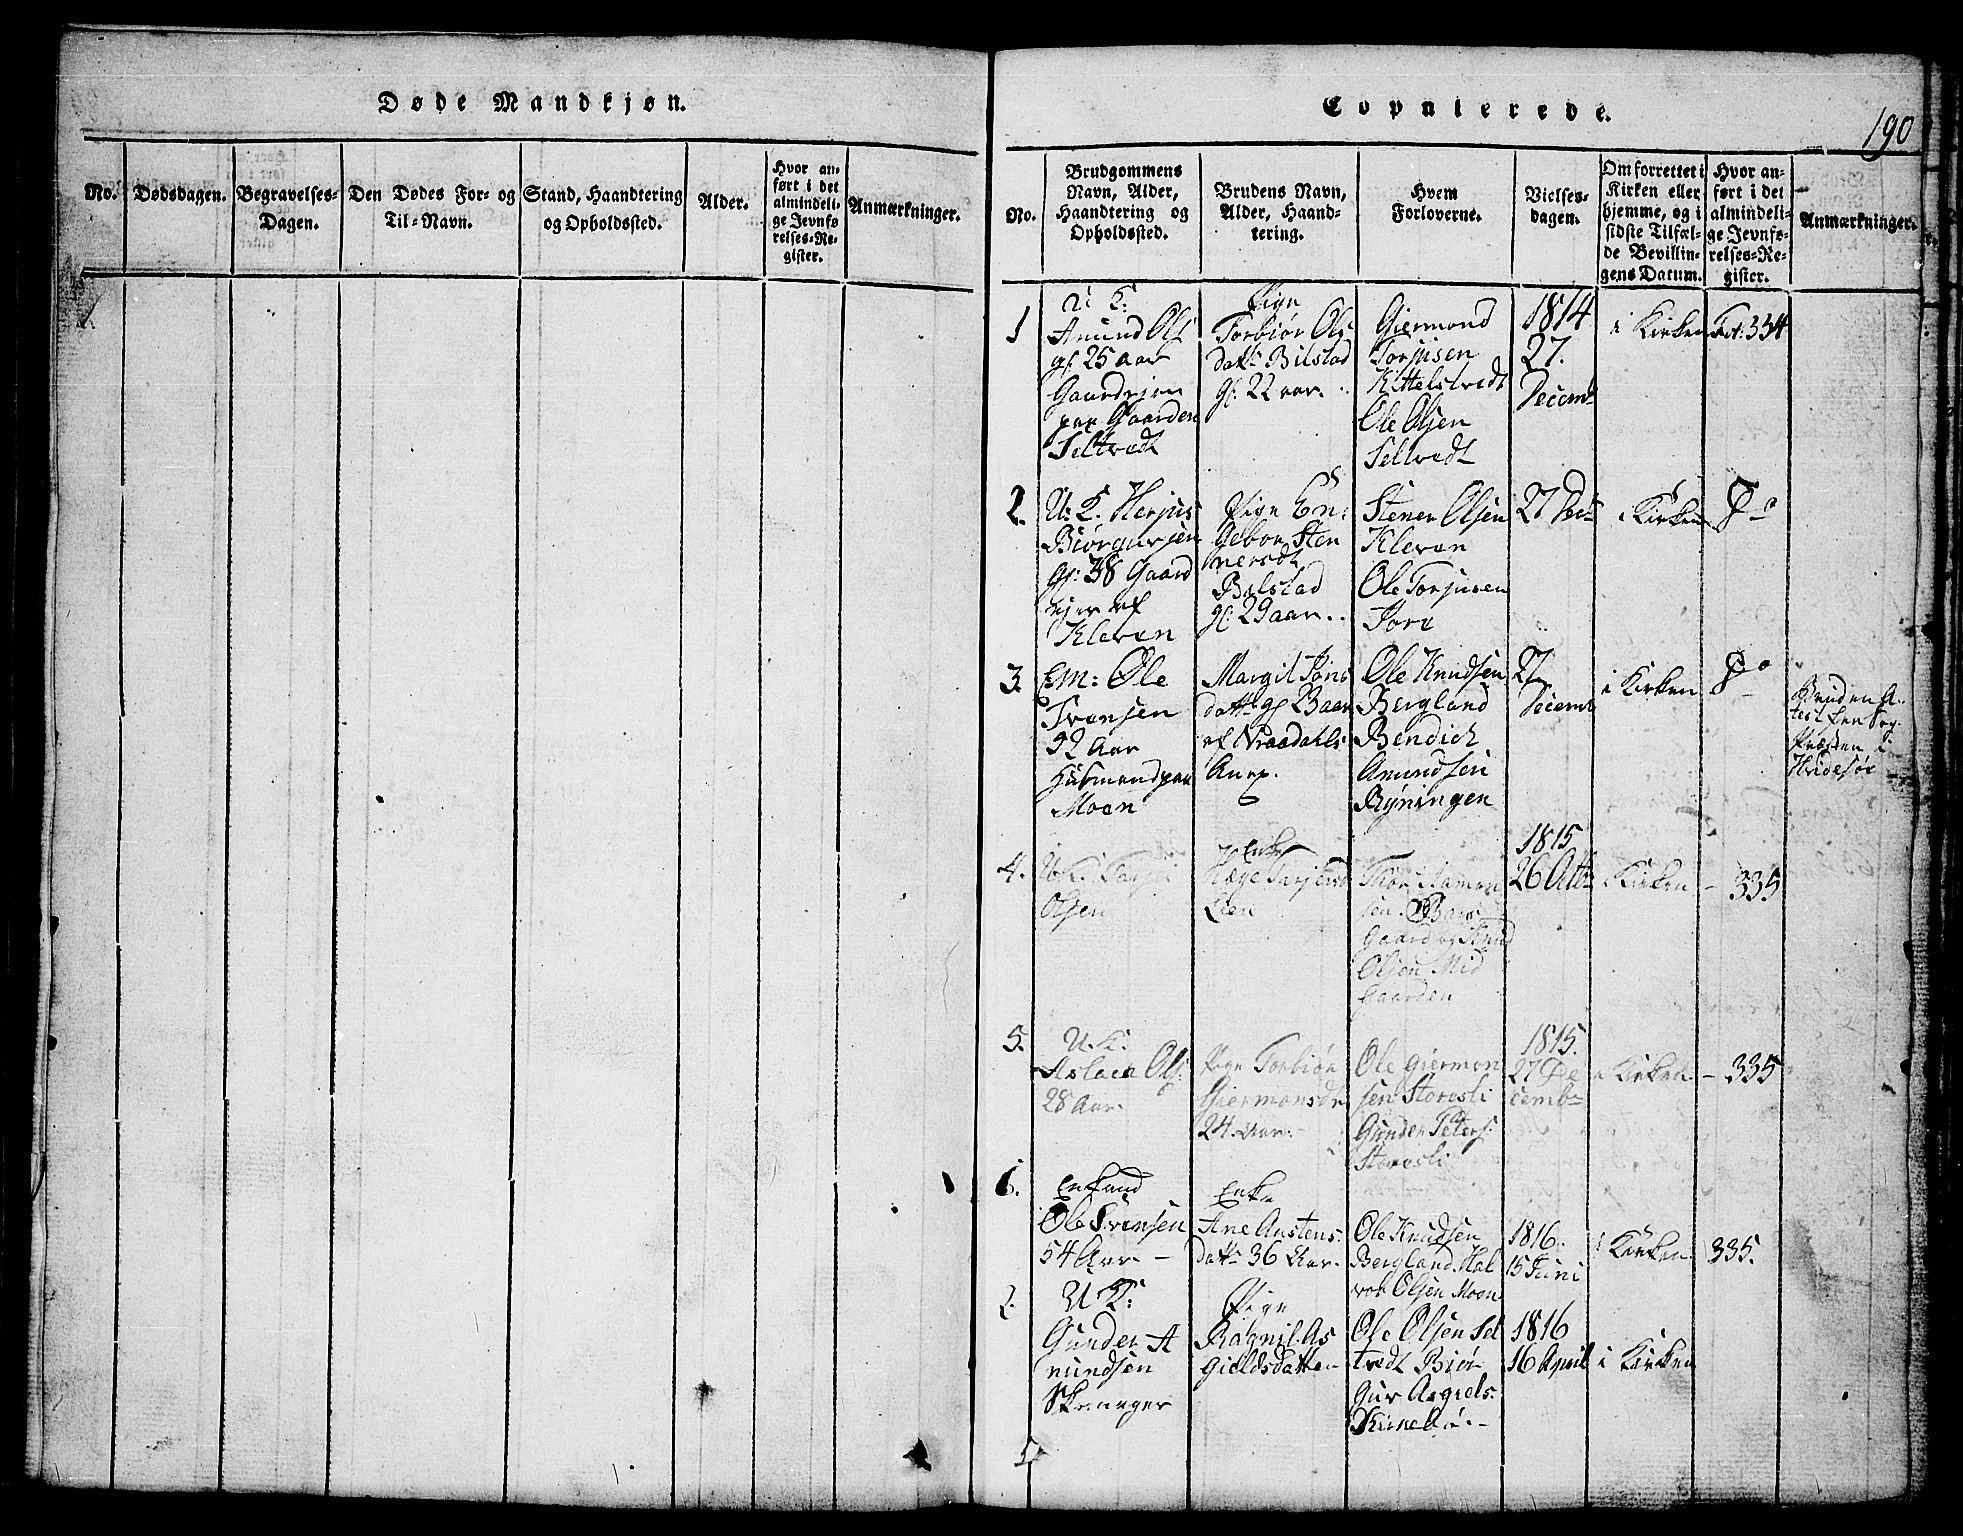 SAKO, Mo kirkebøker, G/Gb/L0001: Klokkerbok nr. II 1, 1814-1843, s. 190